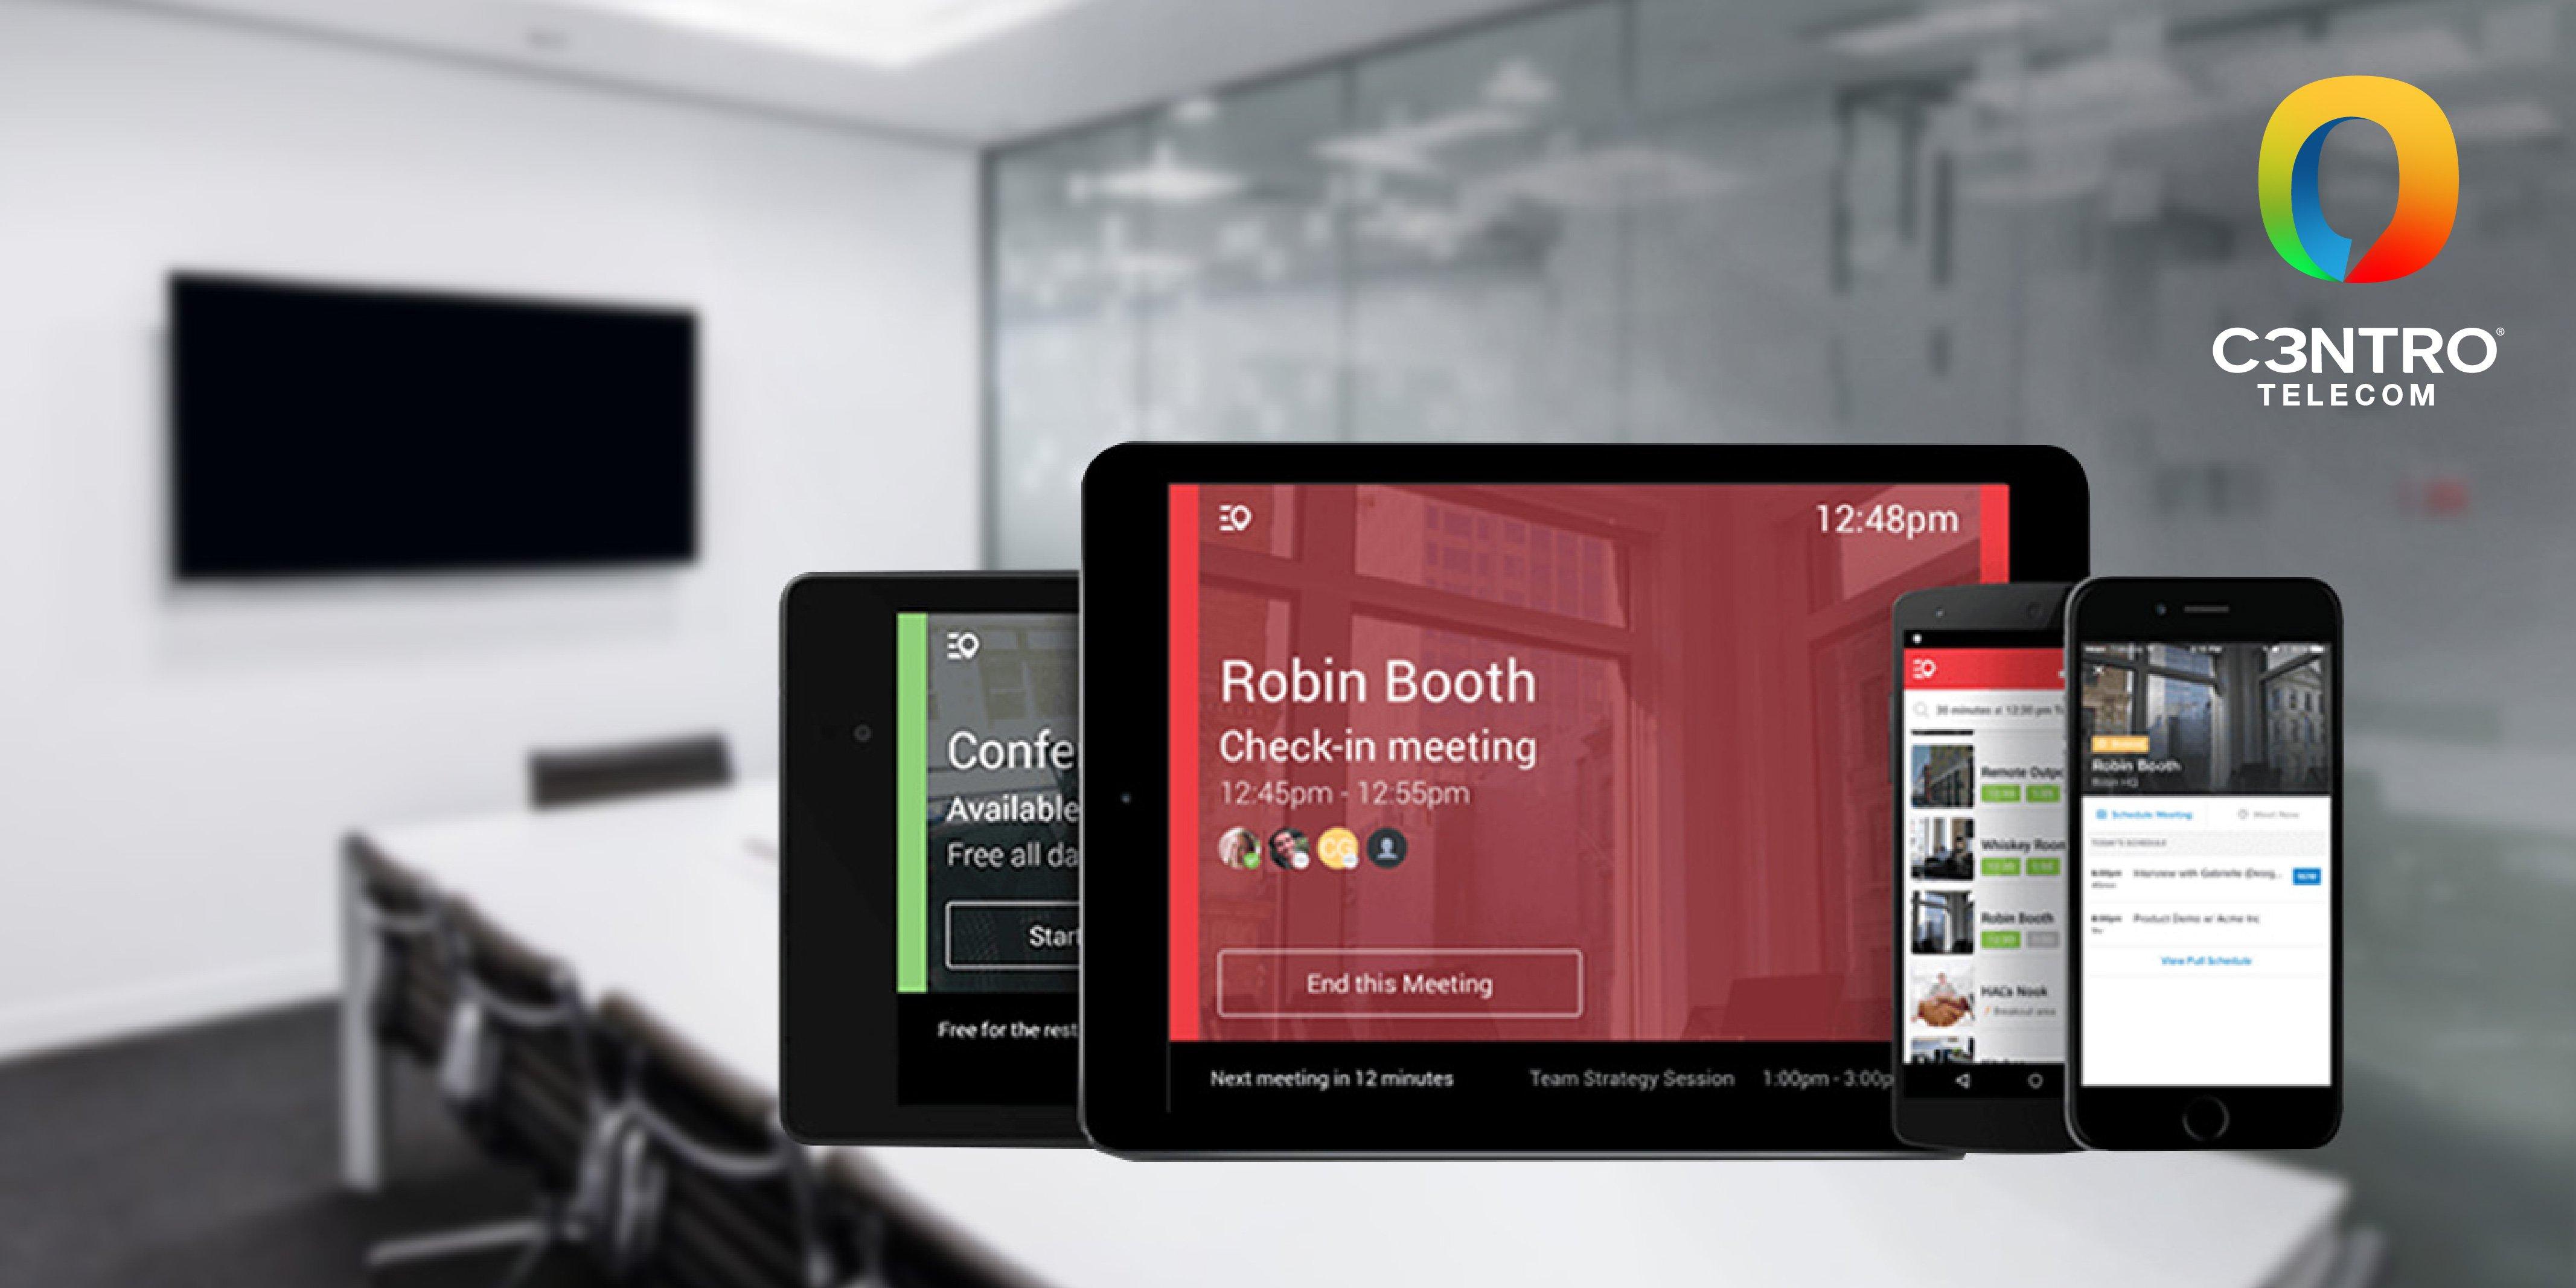 sistema de agendamiento de salas Robin